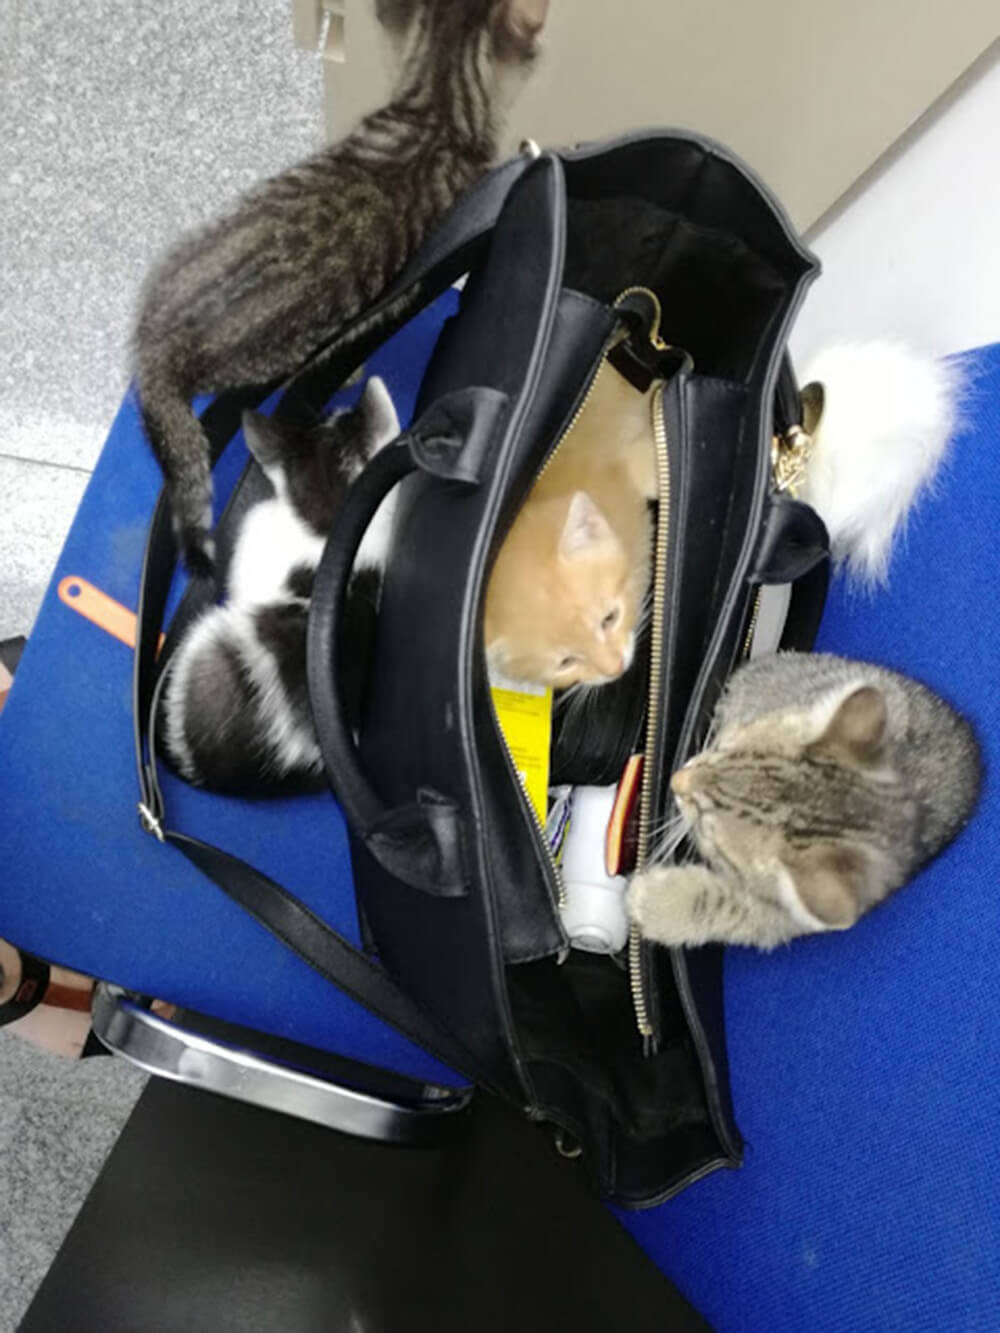 koty w torebce